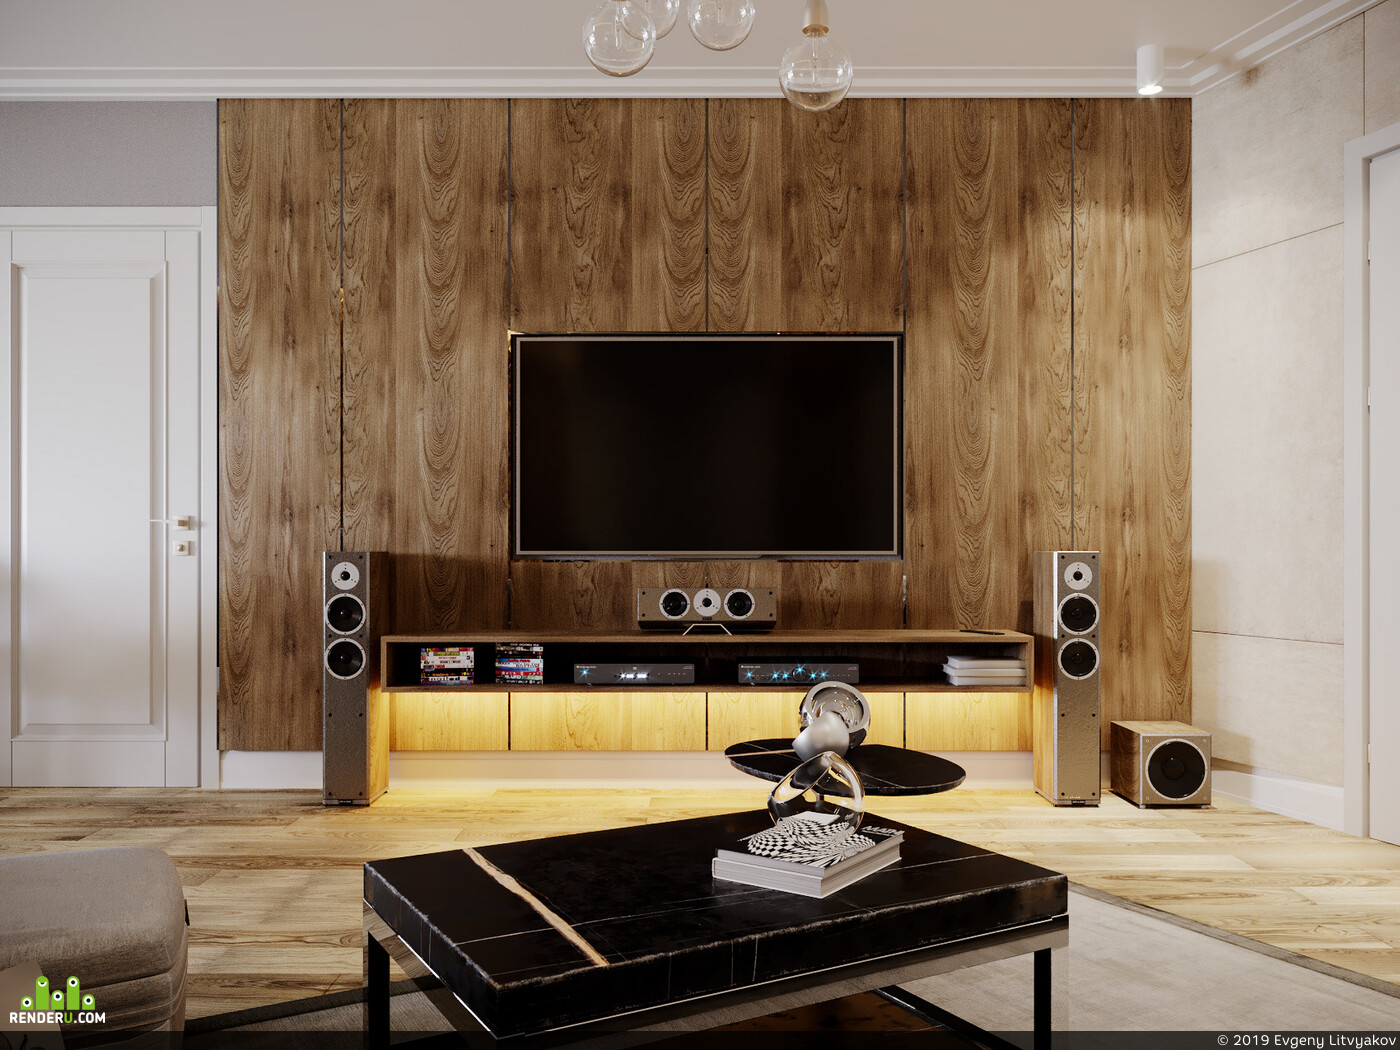 interior design, moderm interior, Corona Renderer, corona 2, 3ds max